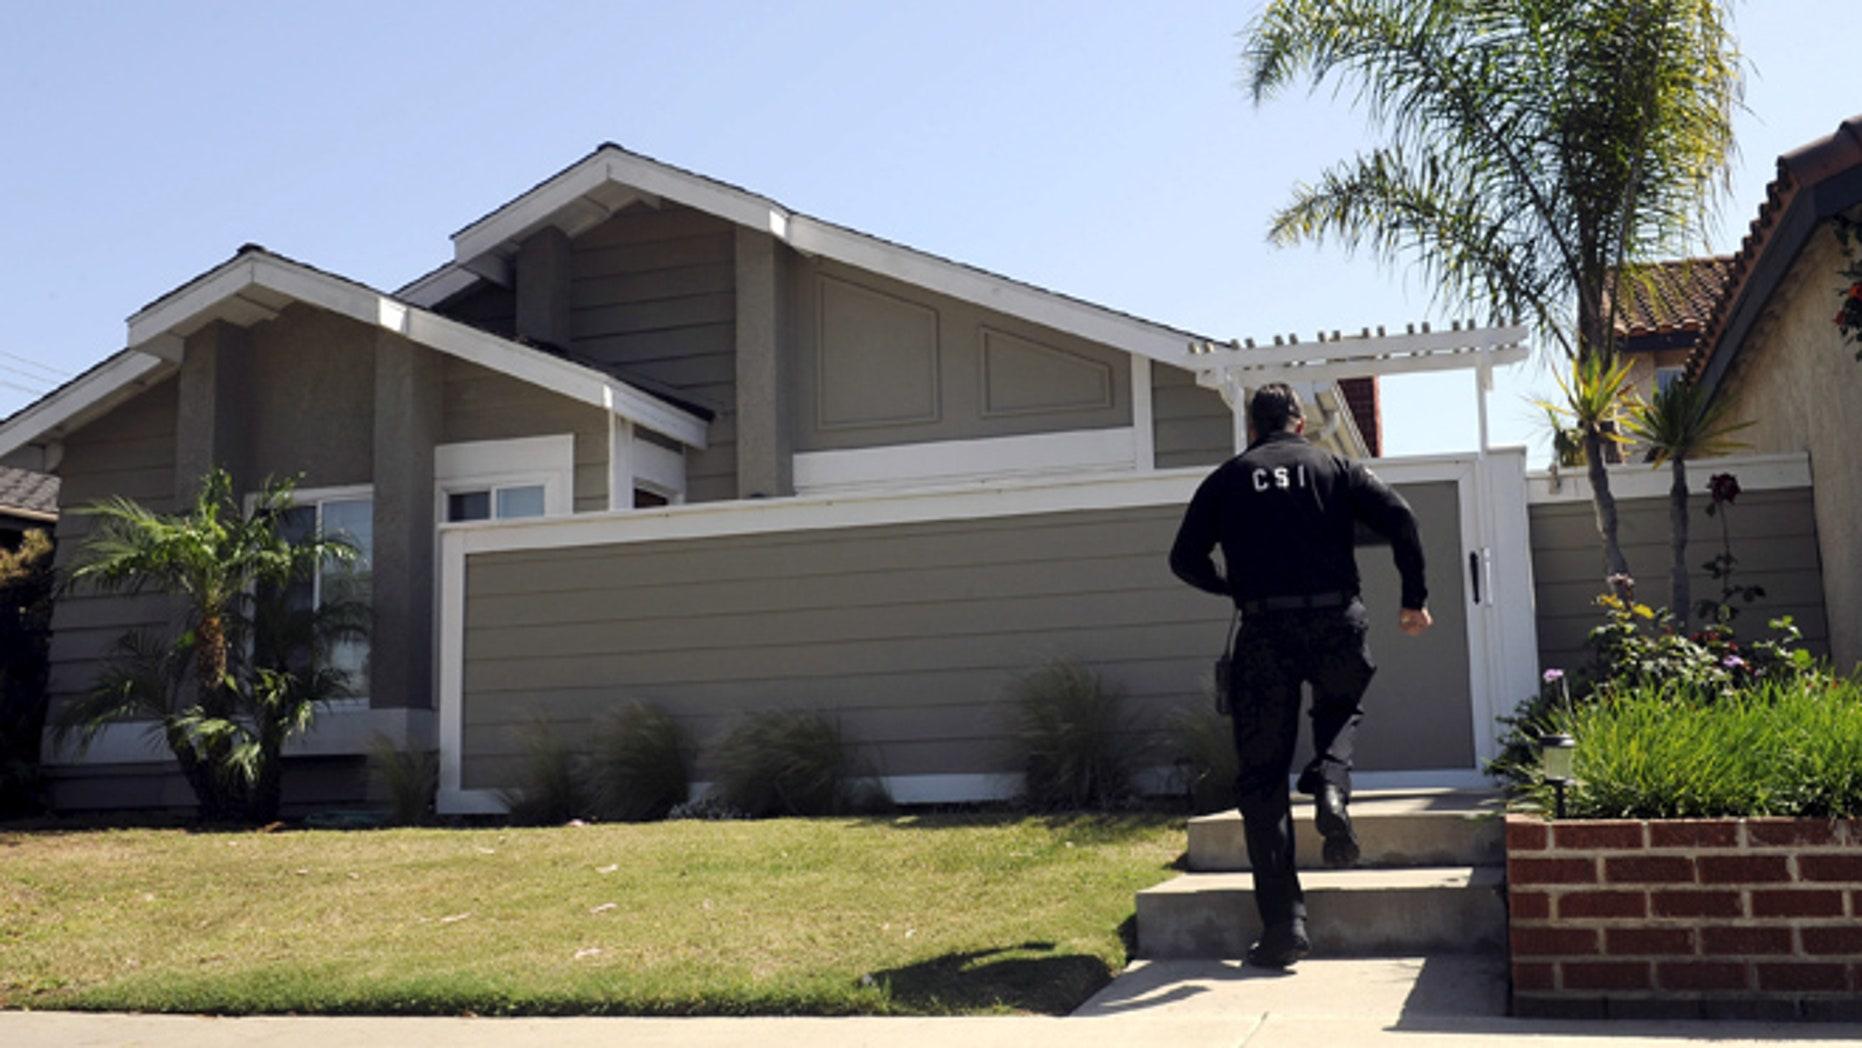 FILE: A Huntington Beach police Crime Scene Investigator is shown at the family home of Denise Huskins in Huntington Beach, California